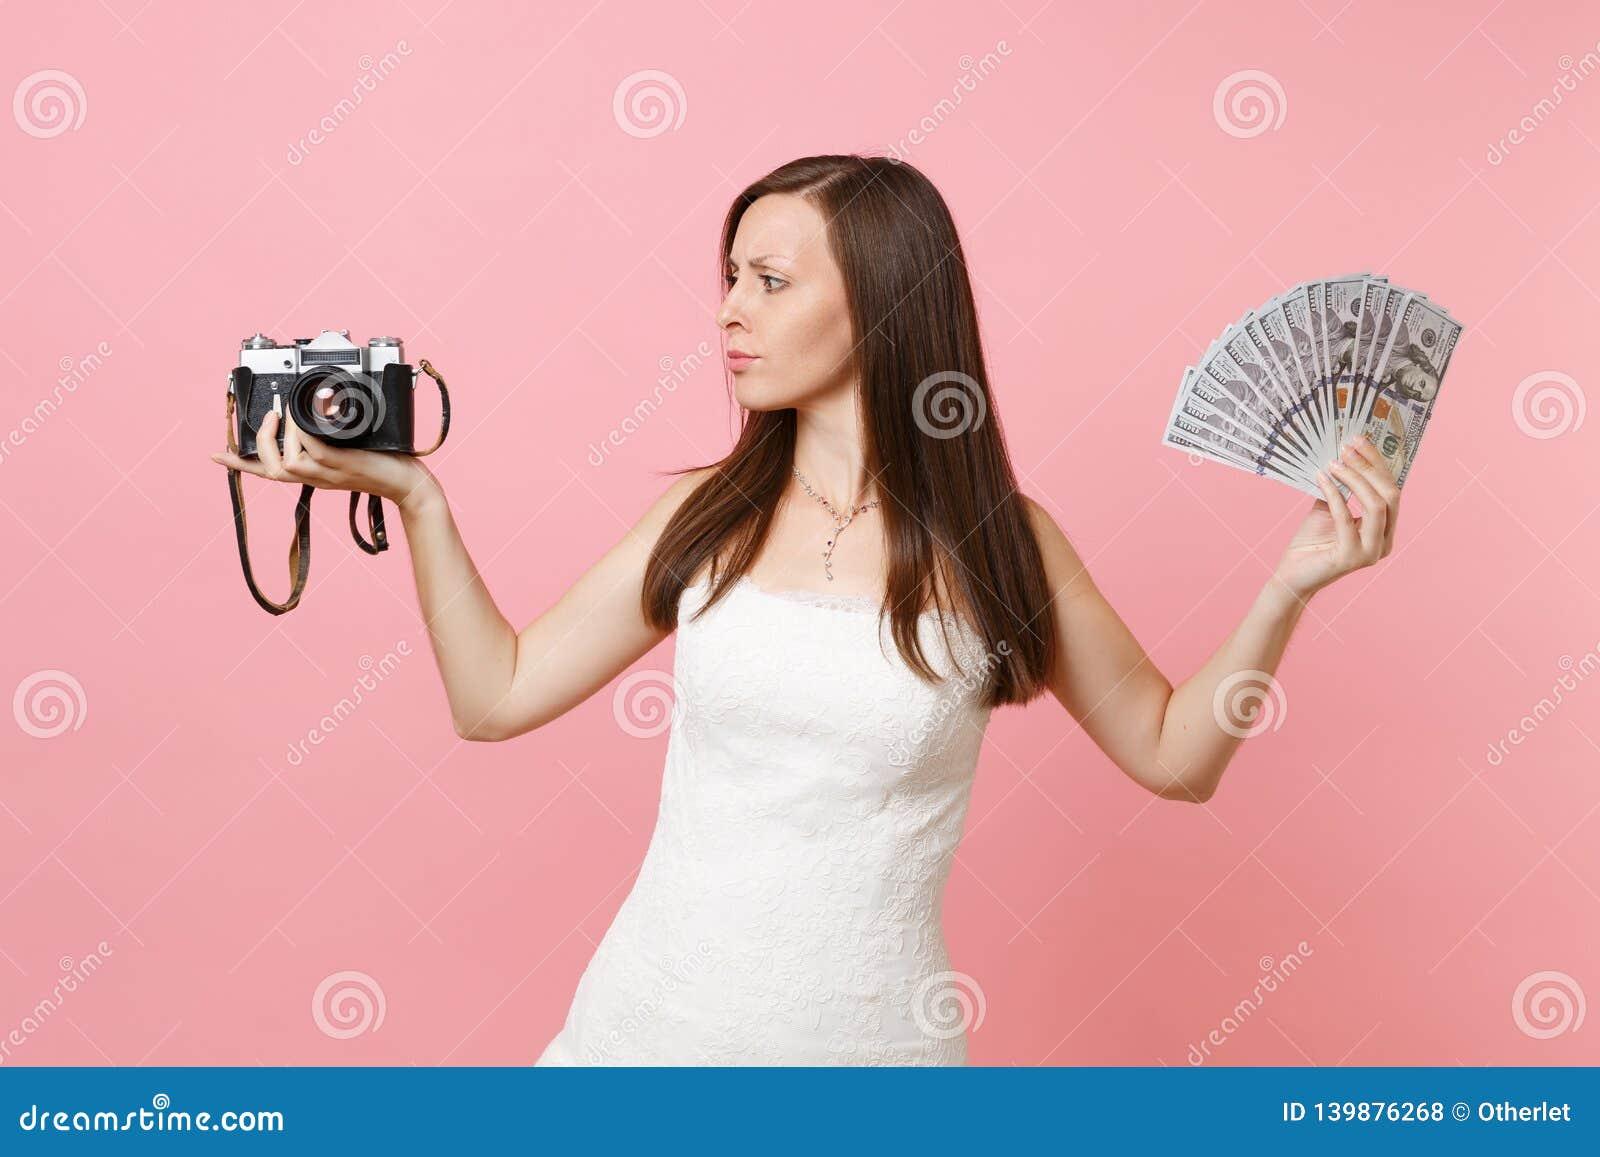 Money Wedding Dresses